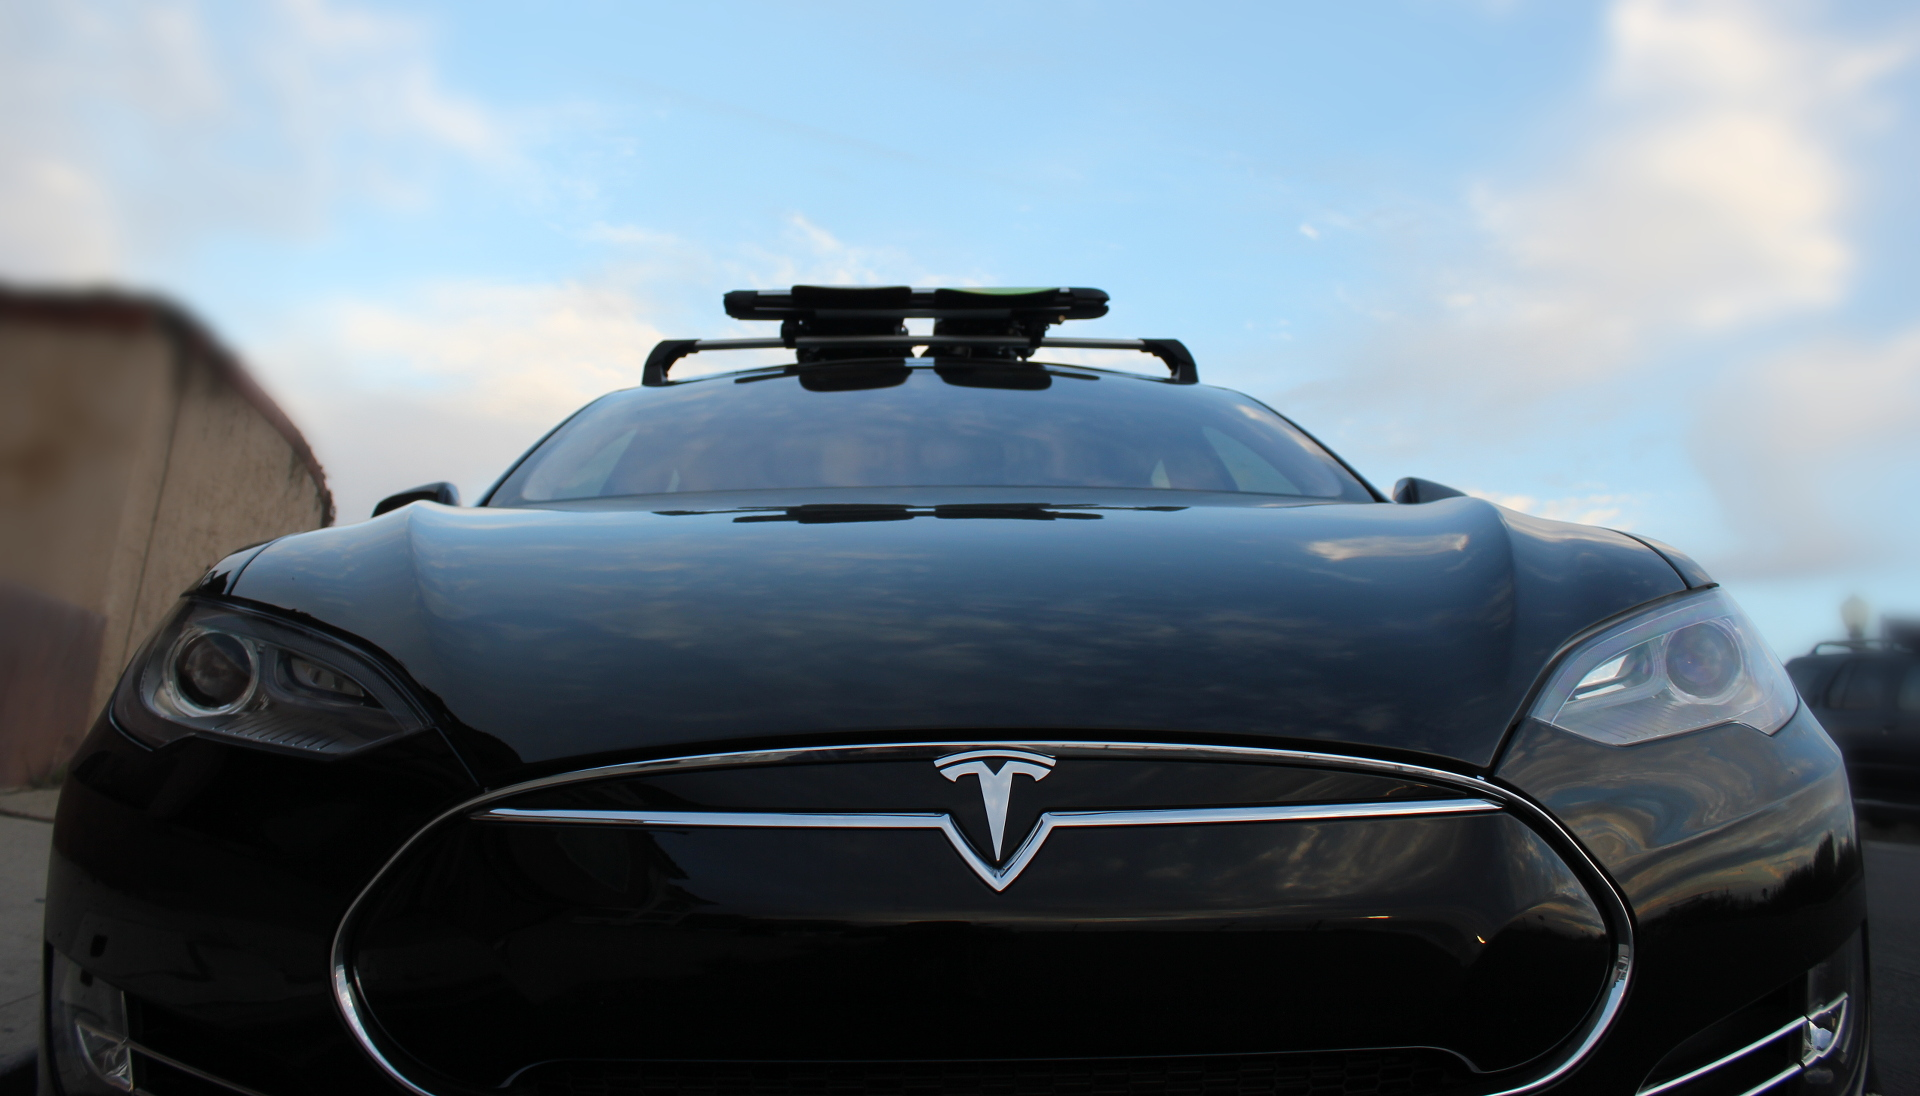 Tesla Model S Roof Rack System Whispbar Review